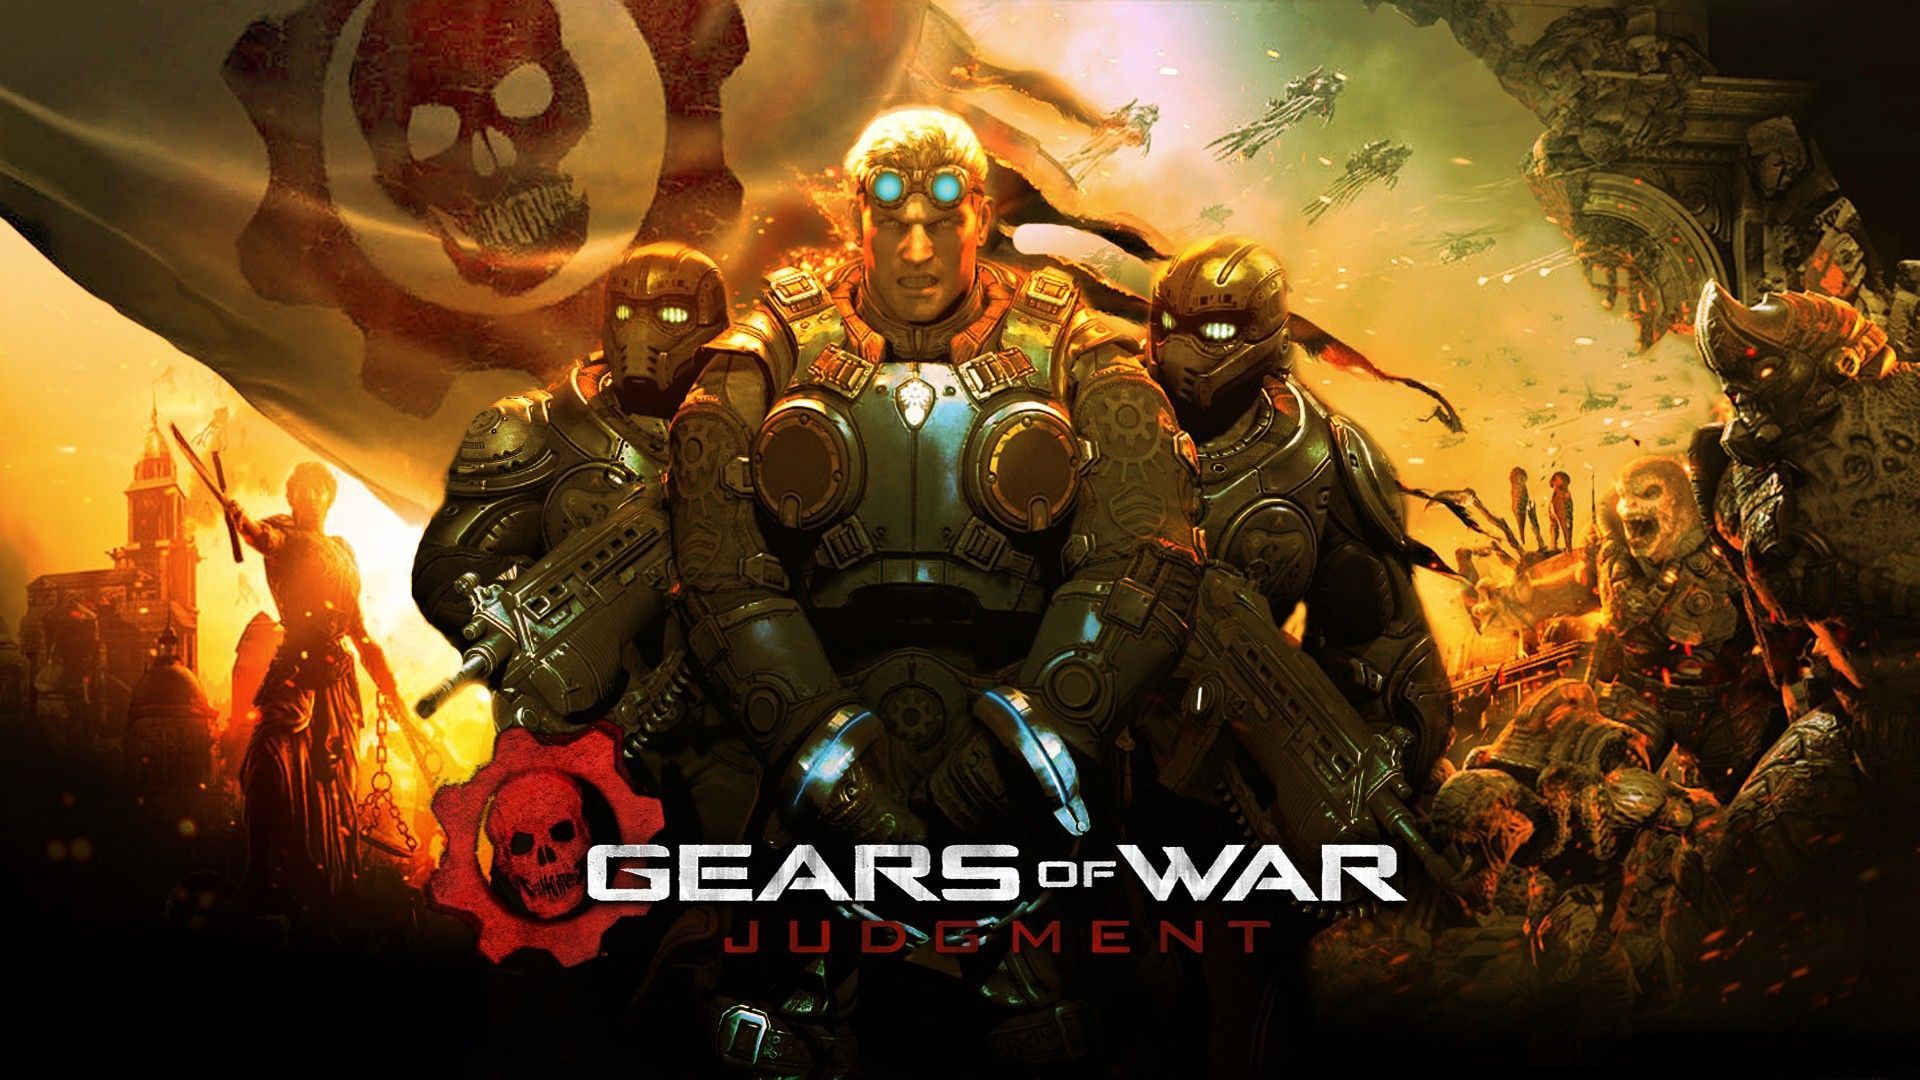 Video Games Gears Of War 1920x1080 Games Gears War Via Www Allwallpaper In With Images Gears Of War Gears Of War Judgment Gears Of War 2